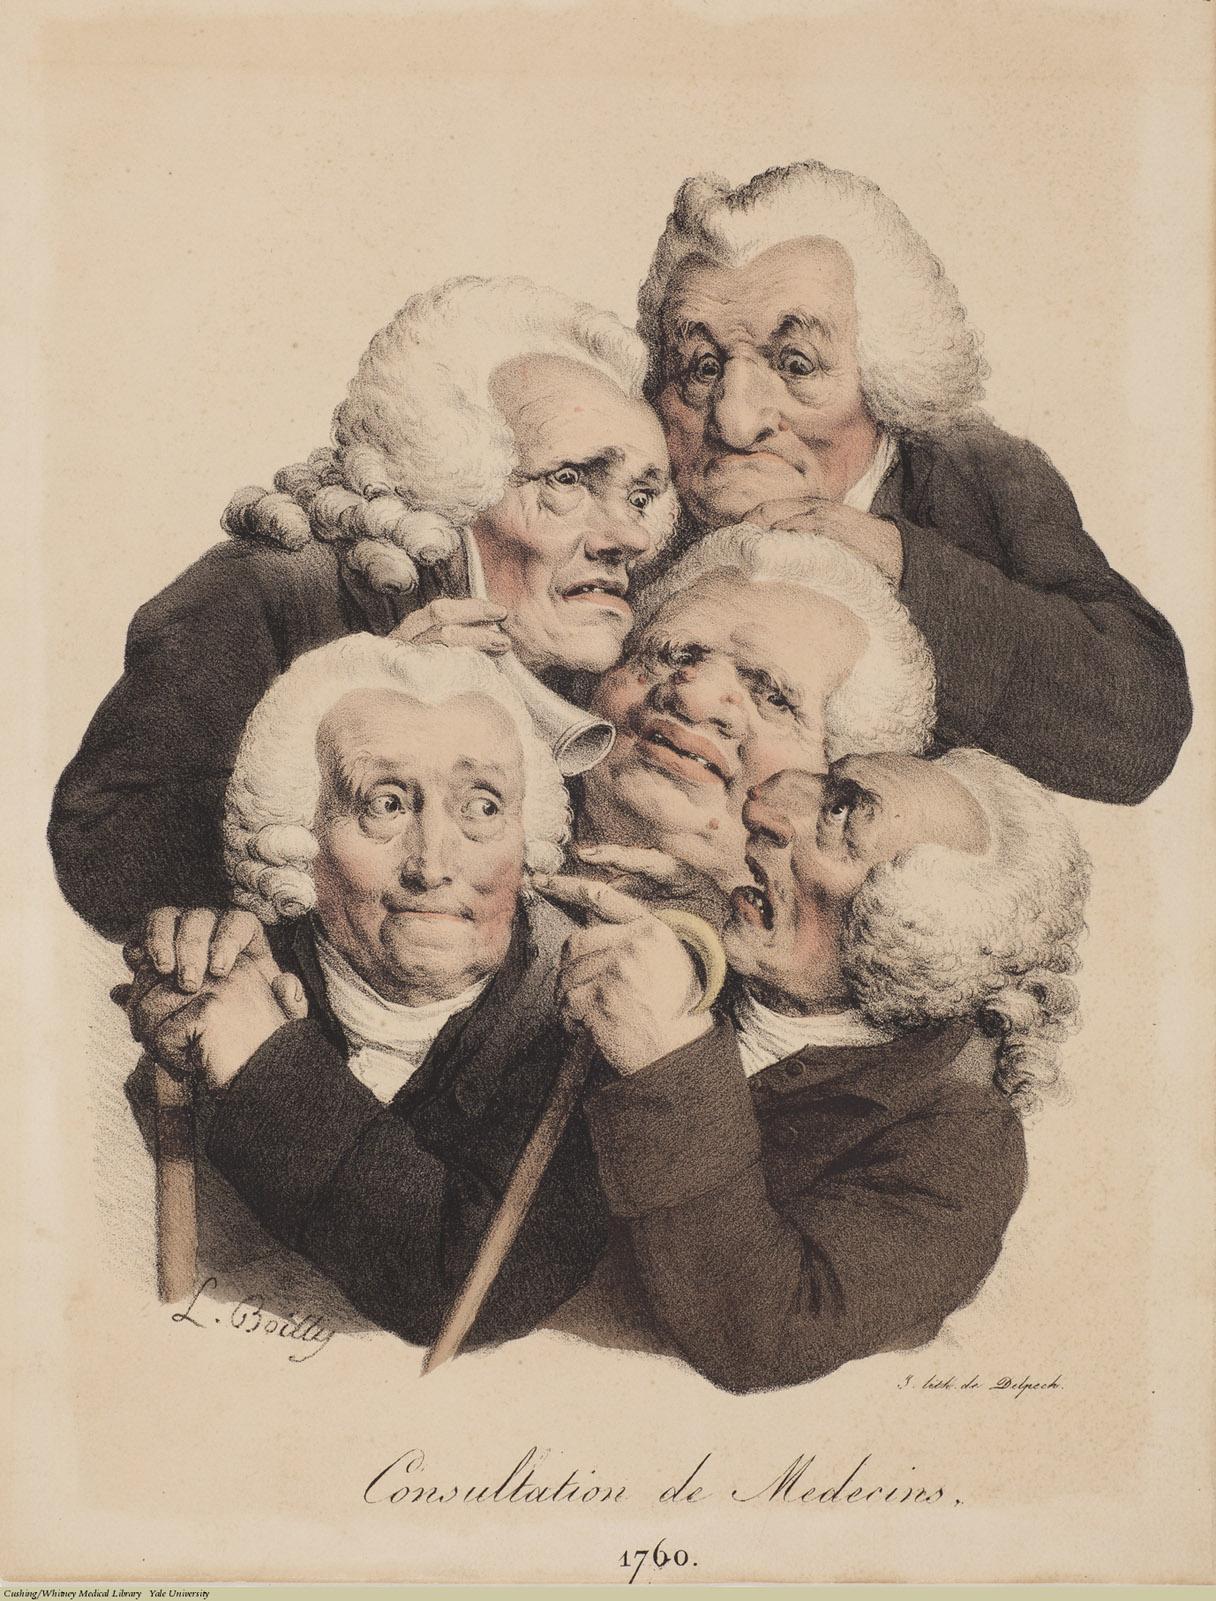 Consultation de Medecins. 1760, Lithograph, Louis-Léopold Boilly.